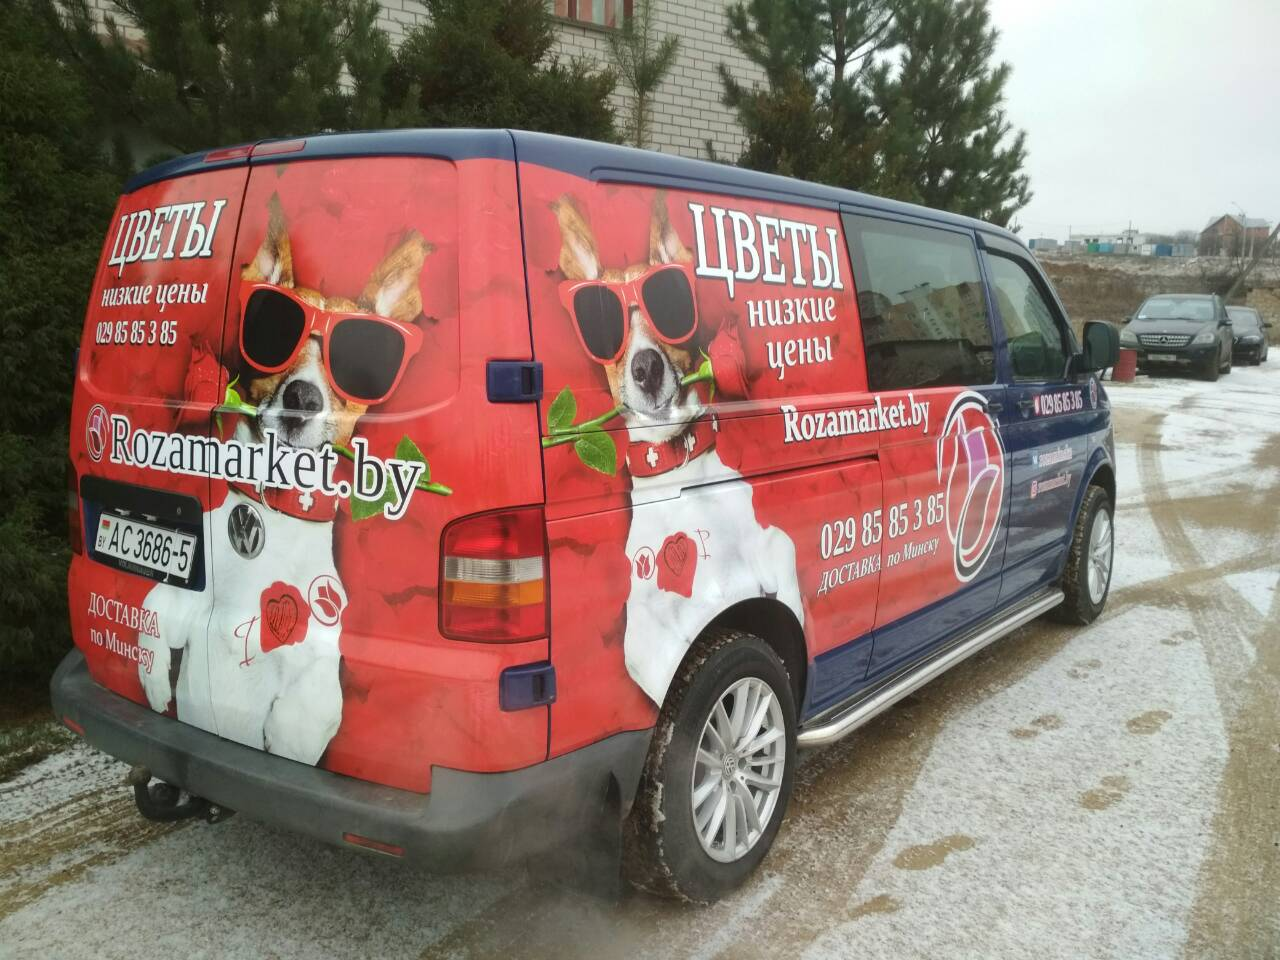 Оклейка автомобилей reklama-on.by